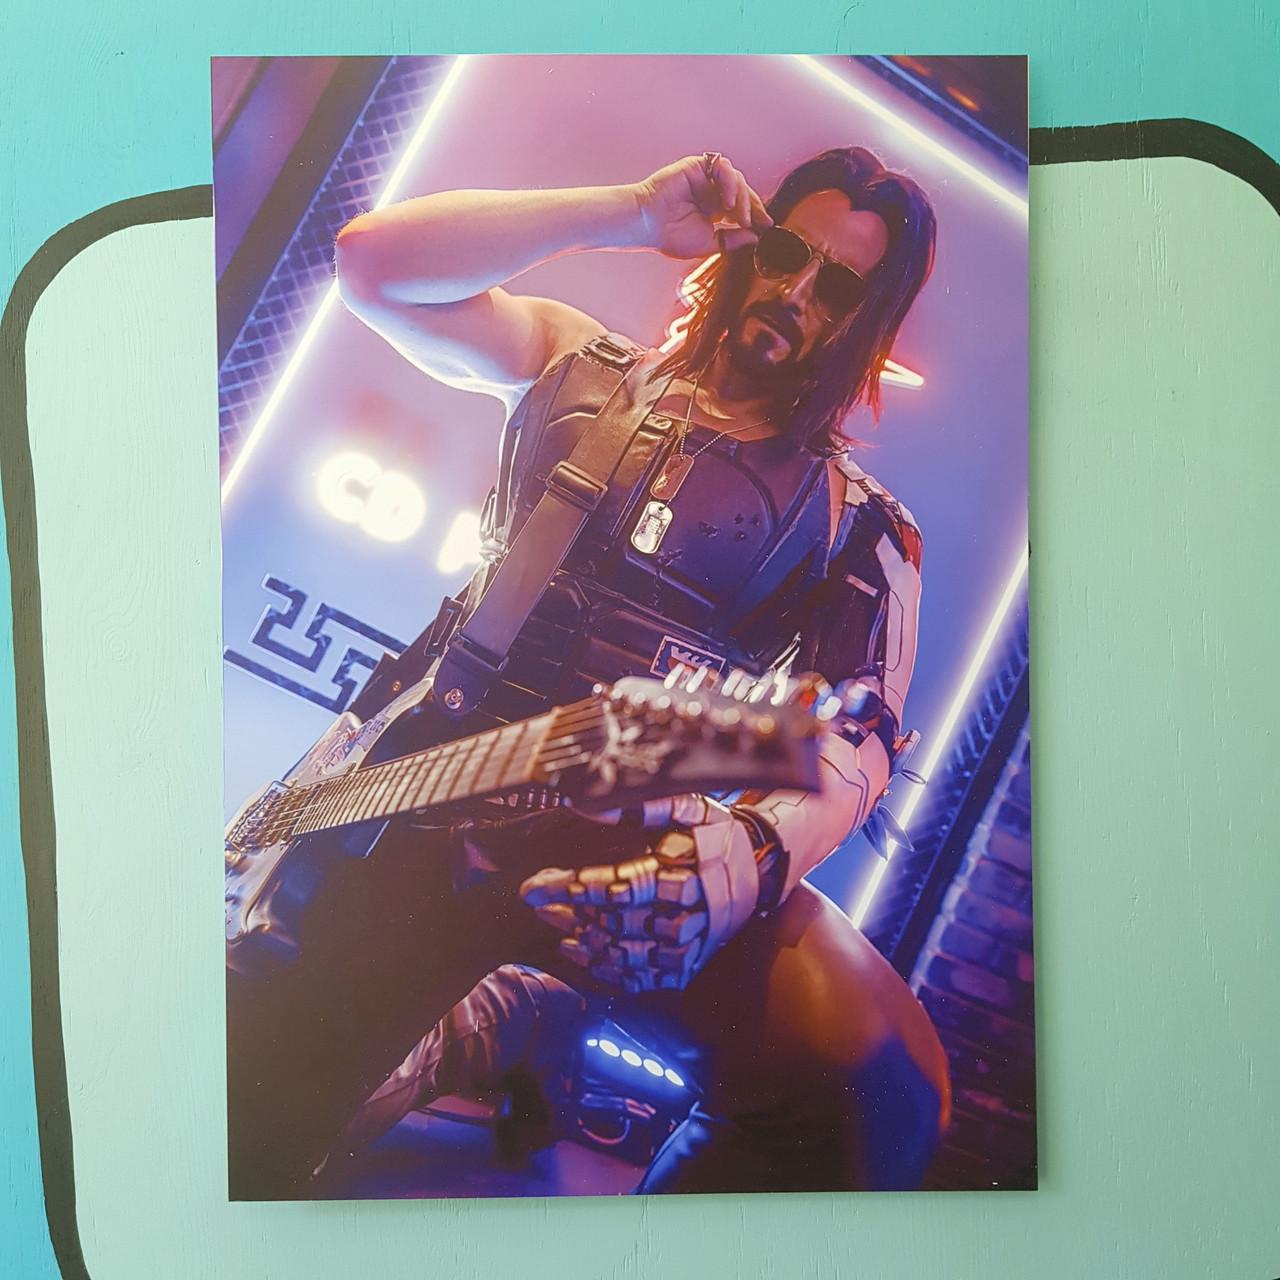 Постер Джонни Сильверхенд - Cyberpunk 2077